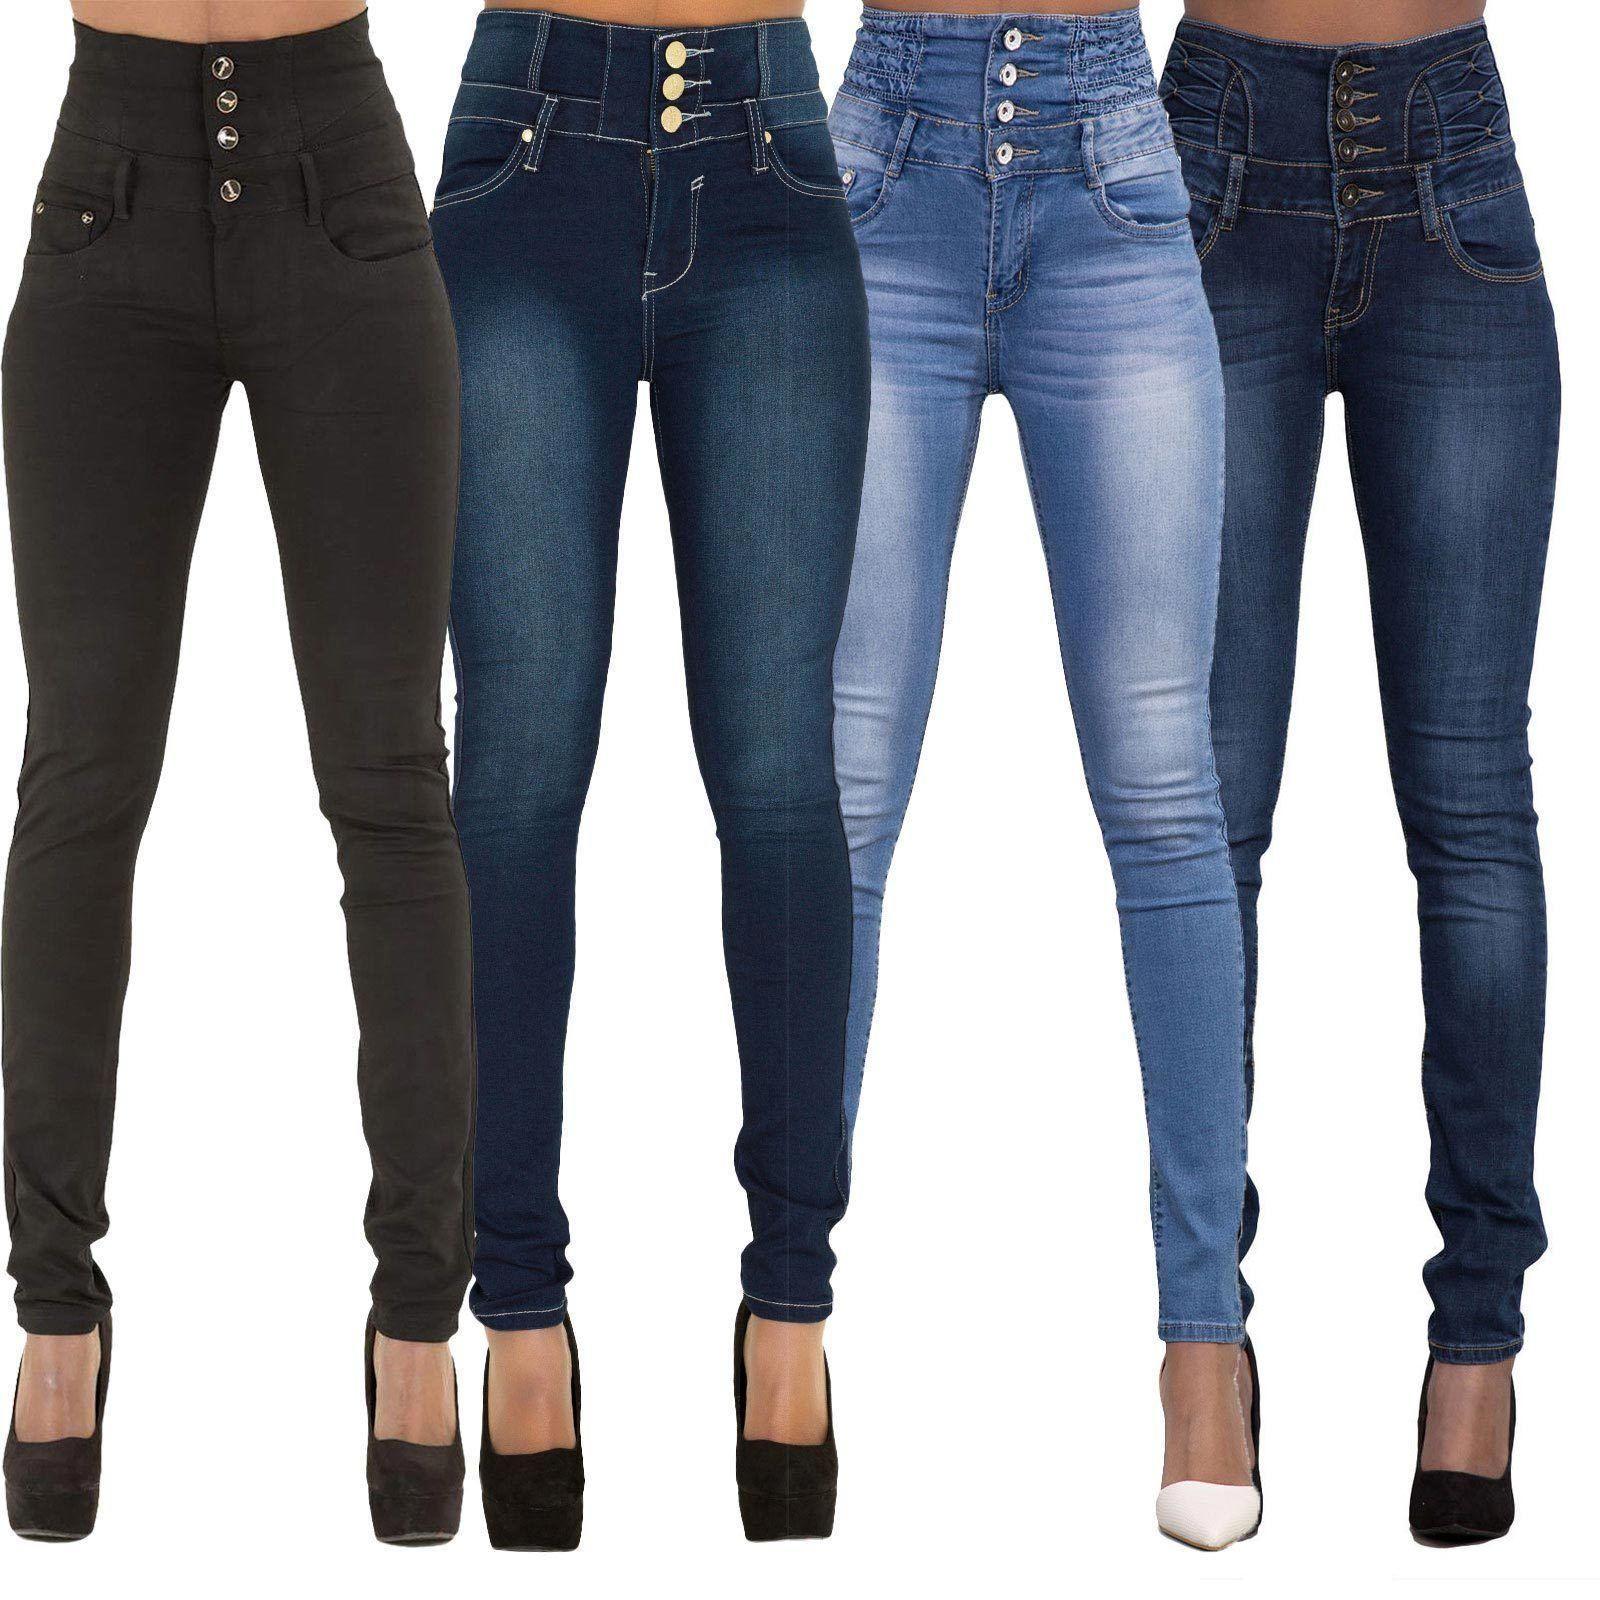 New Fashion Wanita Sexy Slim Celana Pensil Skinny Jeans Melar Big Size Denim Plus Hot Di Dari Pakaian Aksesoris Aliexpresscom